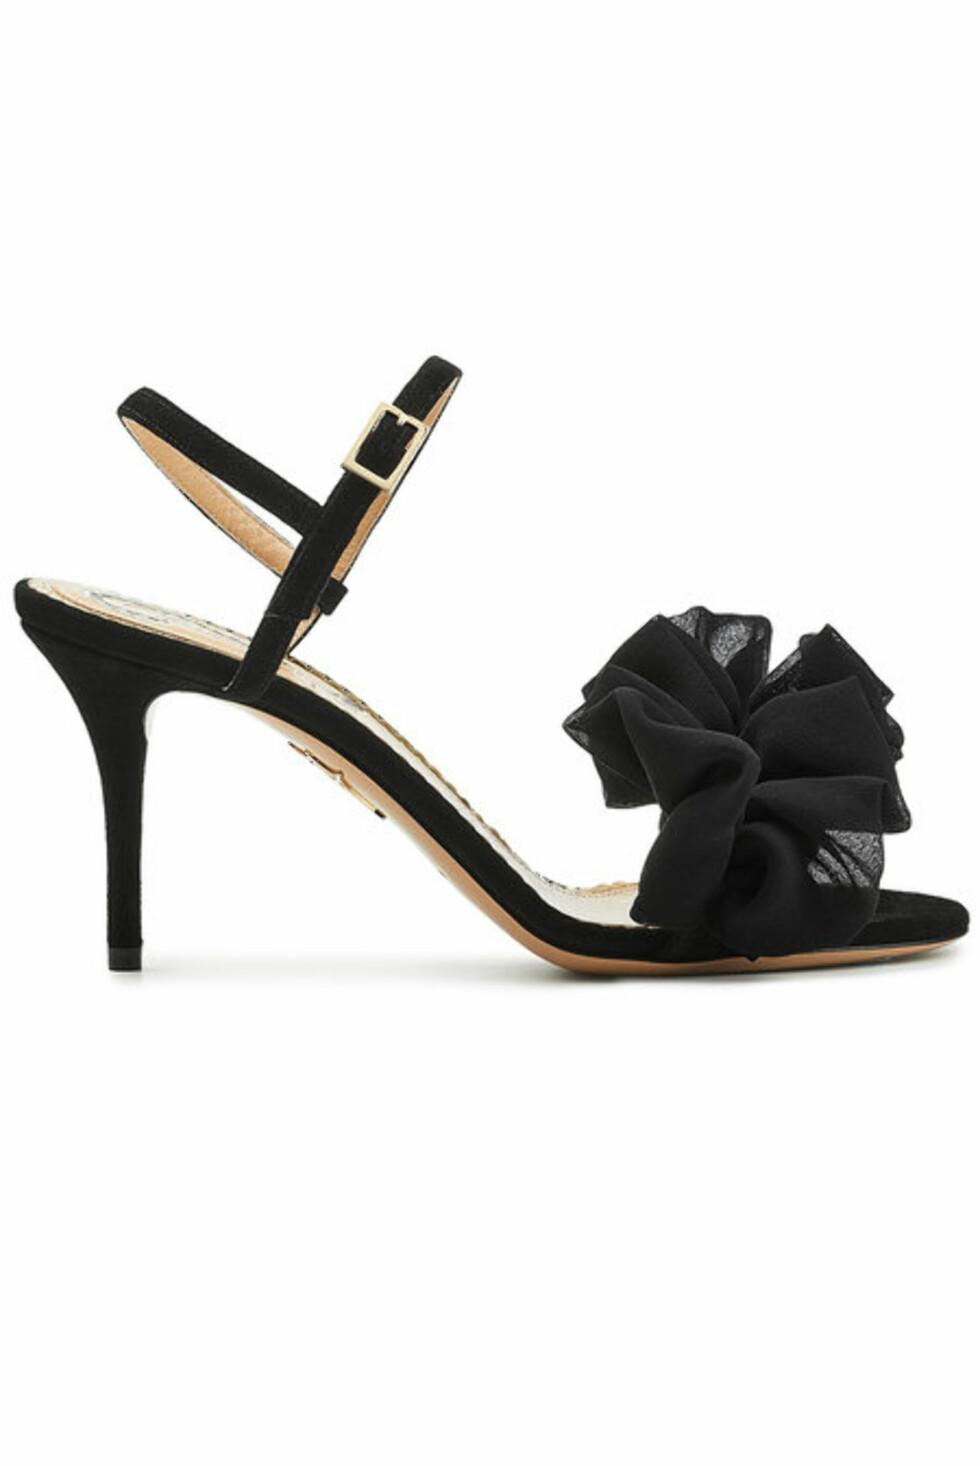 Sko fra Charlotte Olympia |2227,-| https://www.stylebop.com/en-de/women/reia-stiletto-sandals-286545.html